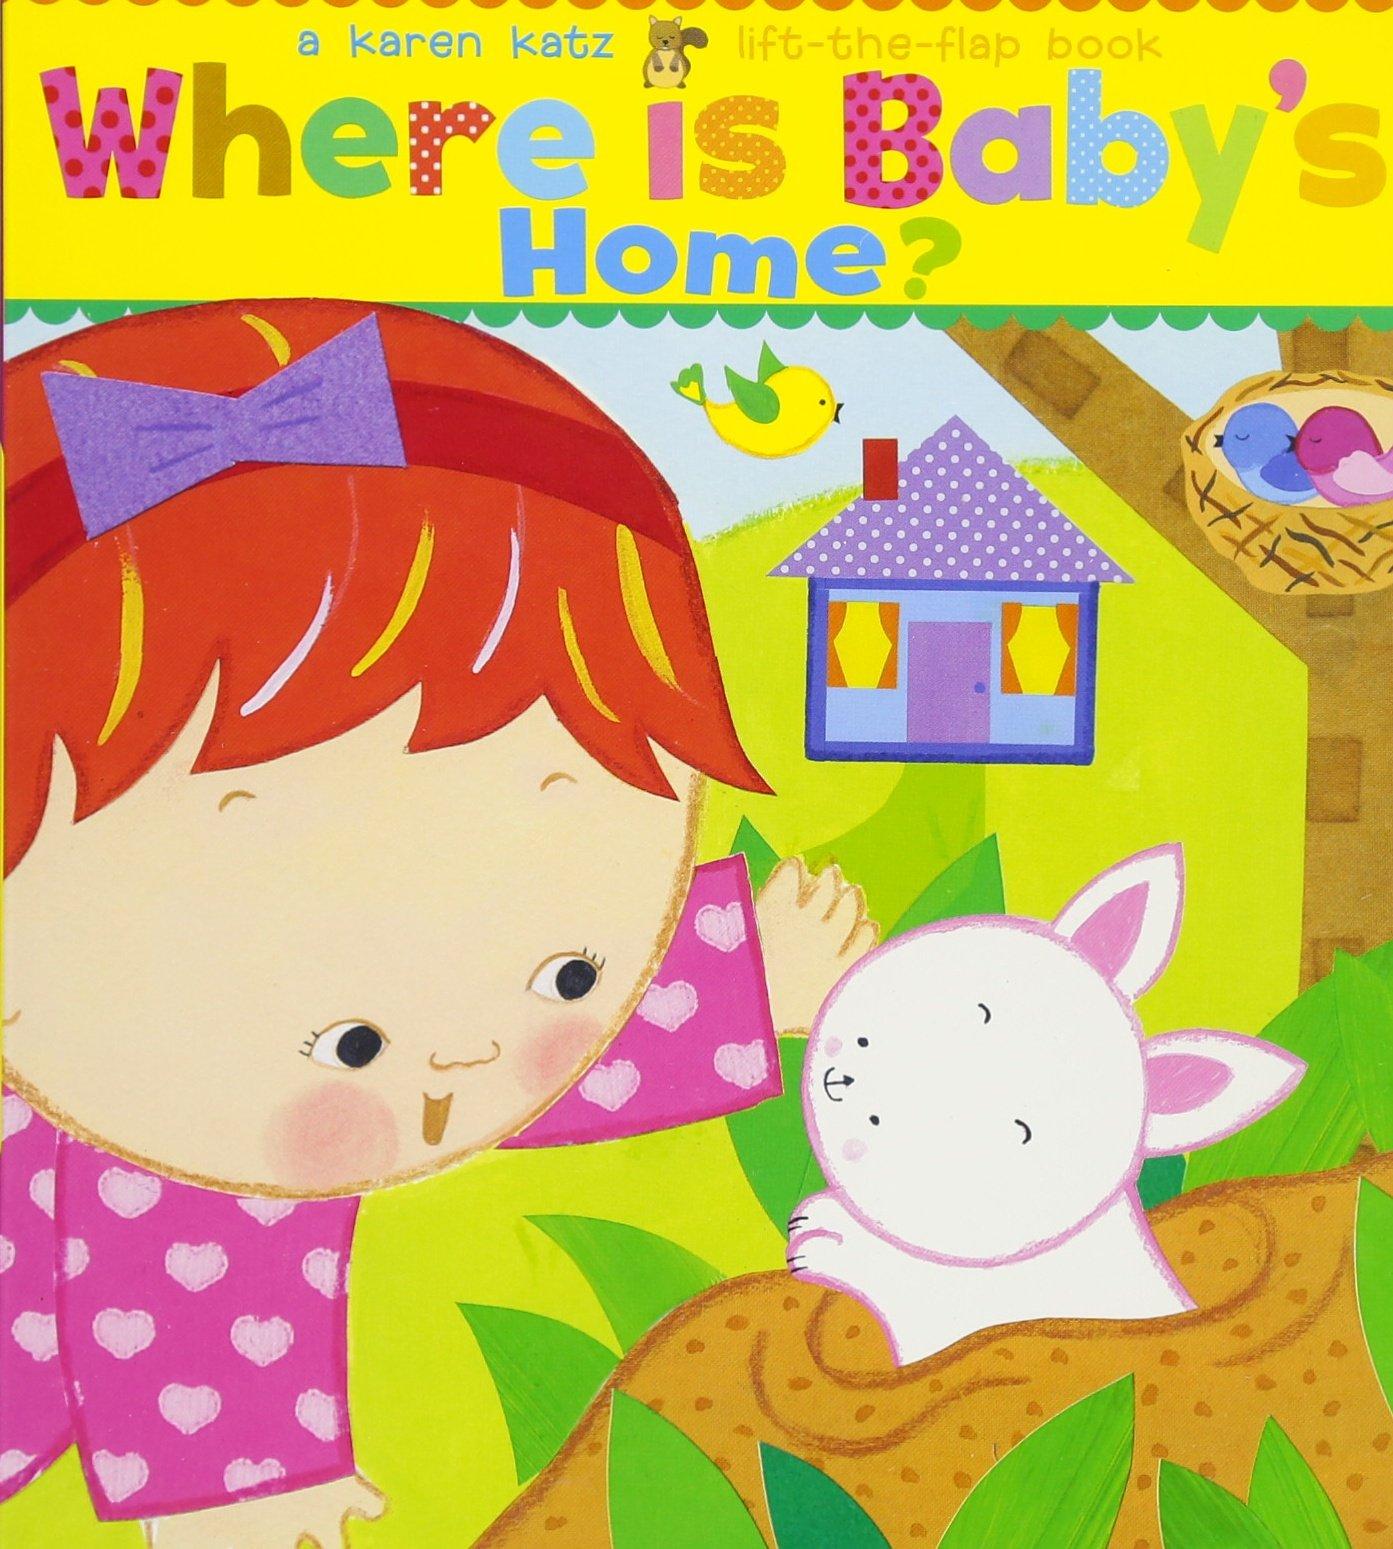 where-is-baby-s-home-a-karen-katz-lift-the-flap-book-karen-katz-lift-the-flap-books